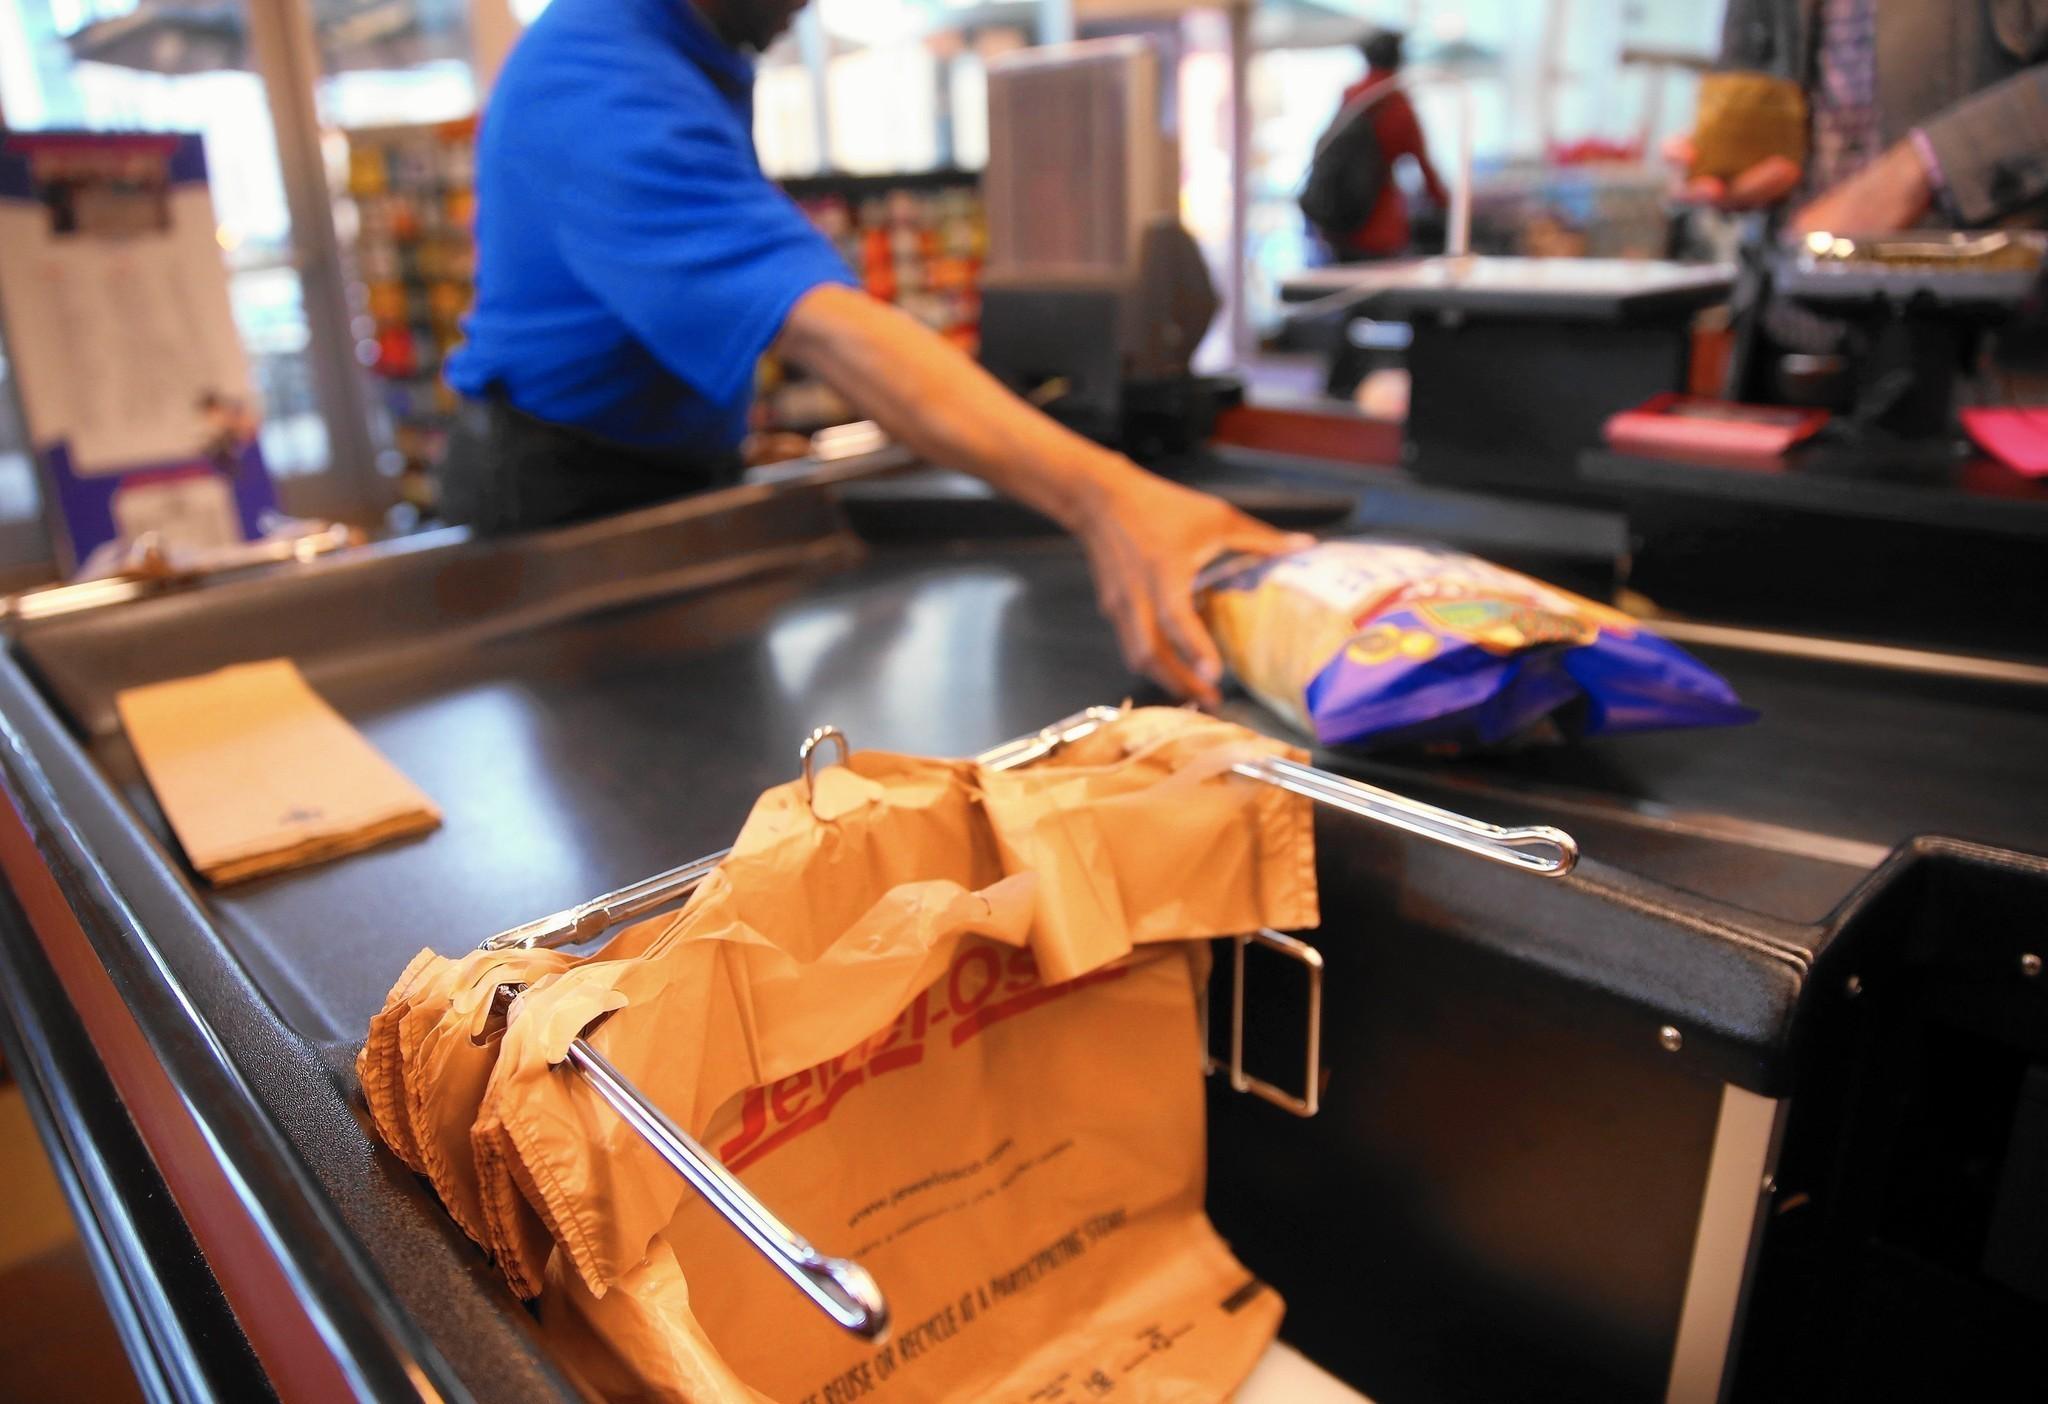 Plastic bag ban chicago - Poop Bag Entrepreneurs See Opportunity In Chicago S Plastic Bag Ban Chicago Tribune